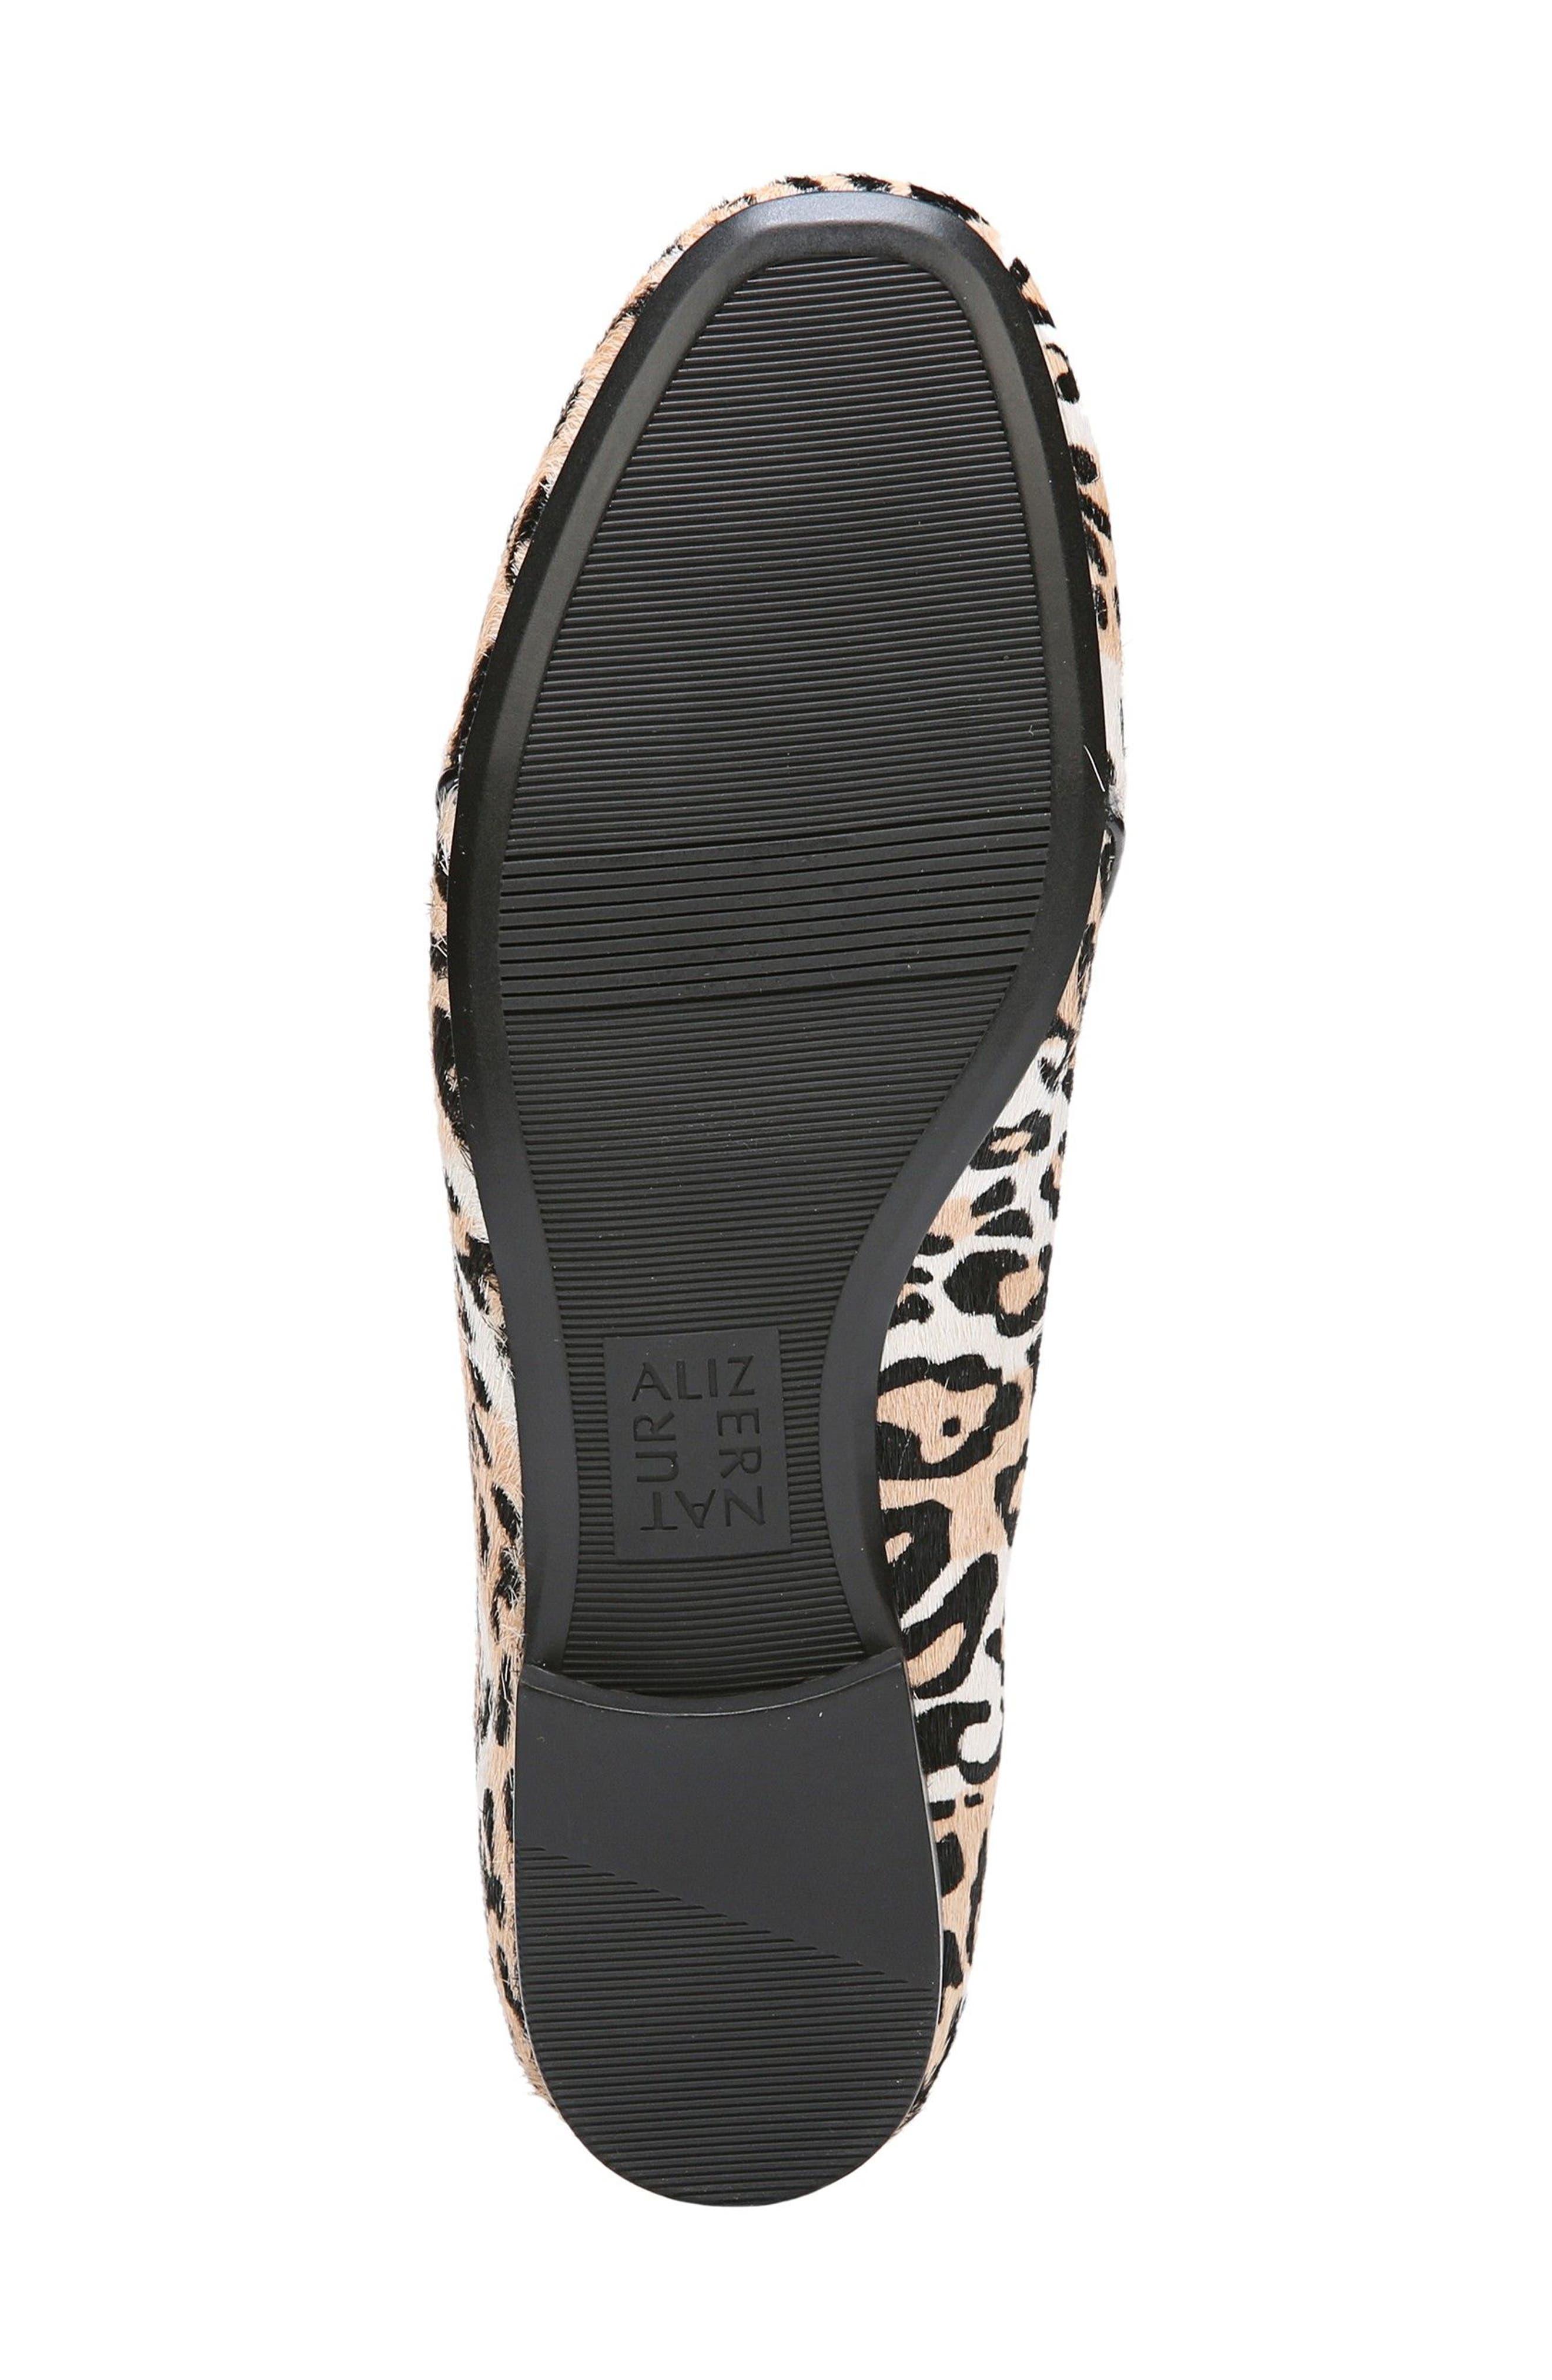 Emiline 2 Loafer,                             Alternate thumbnail 6, color,                             Cheetah Brahma Hair